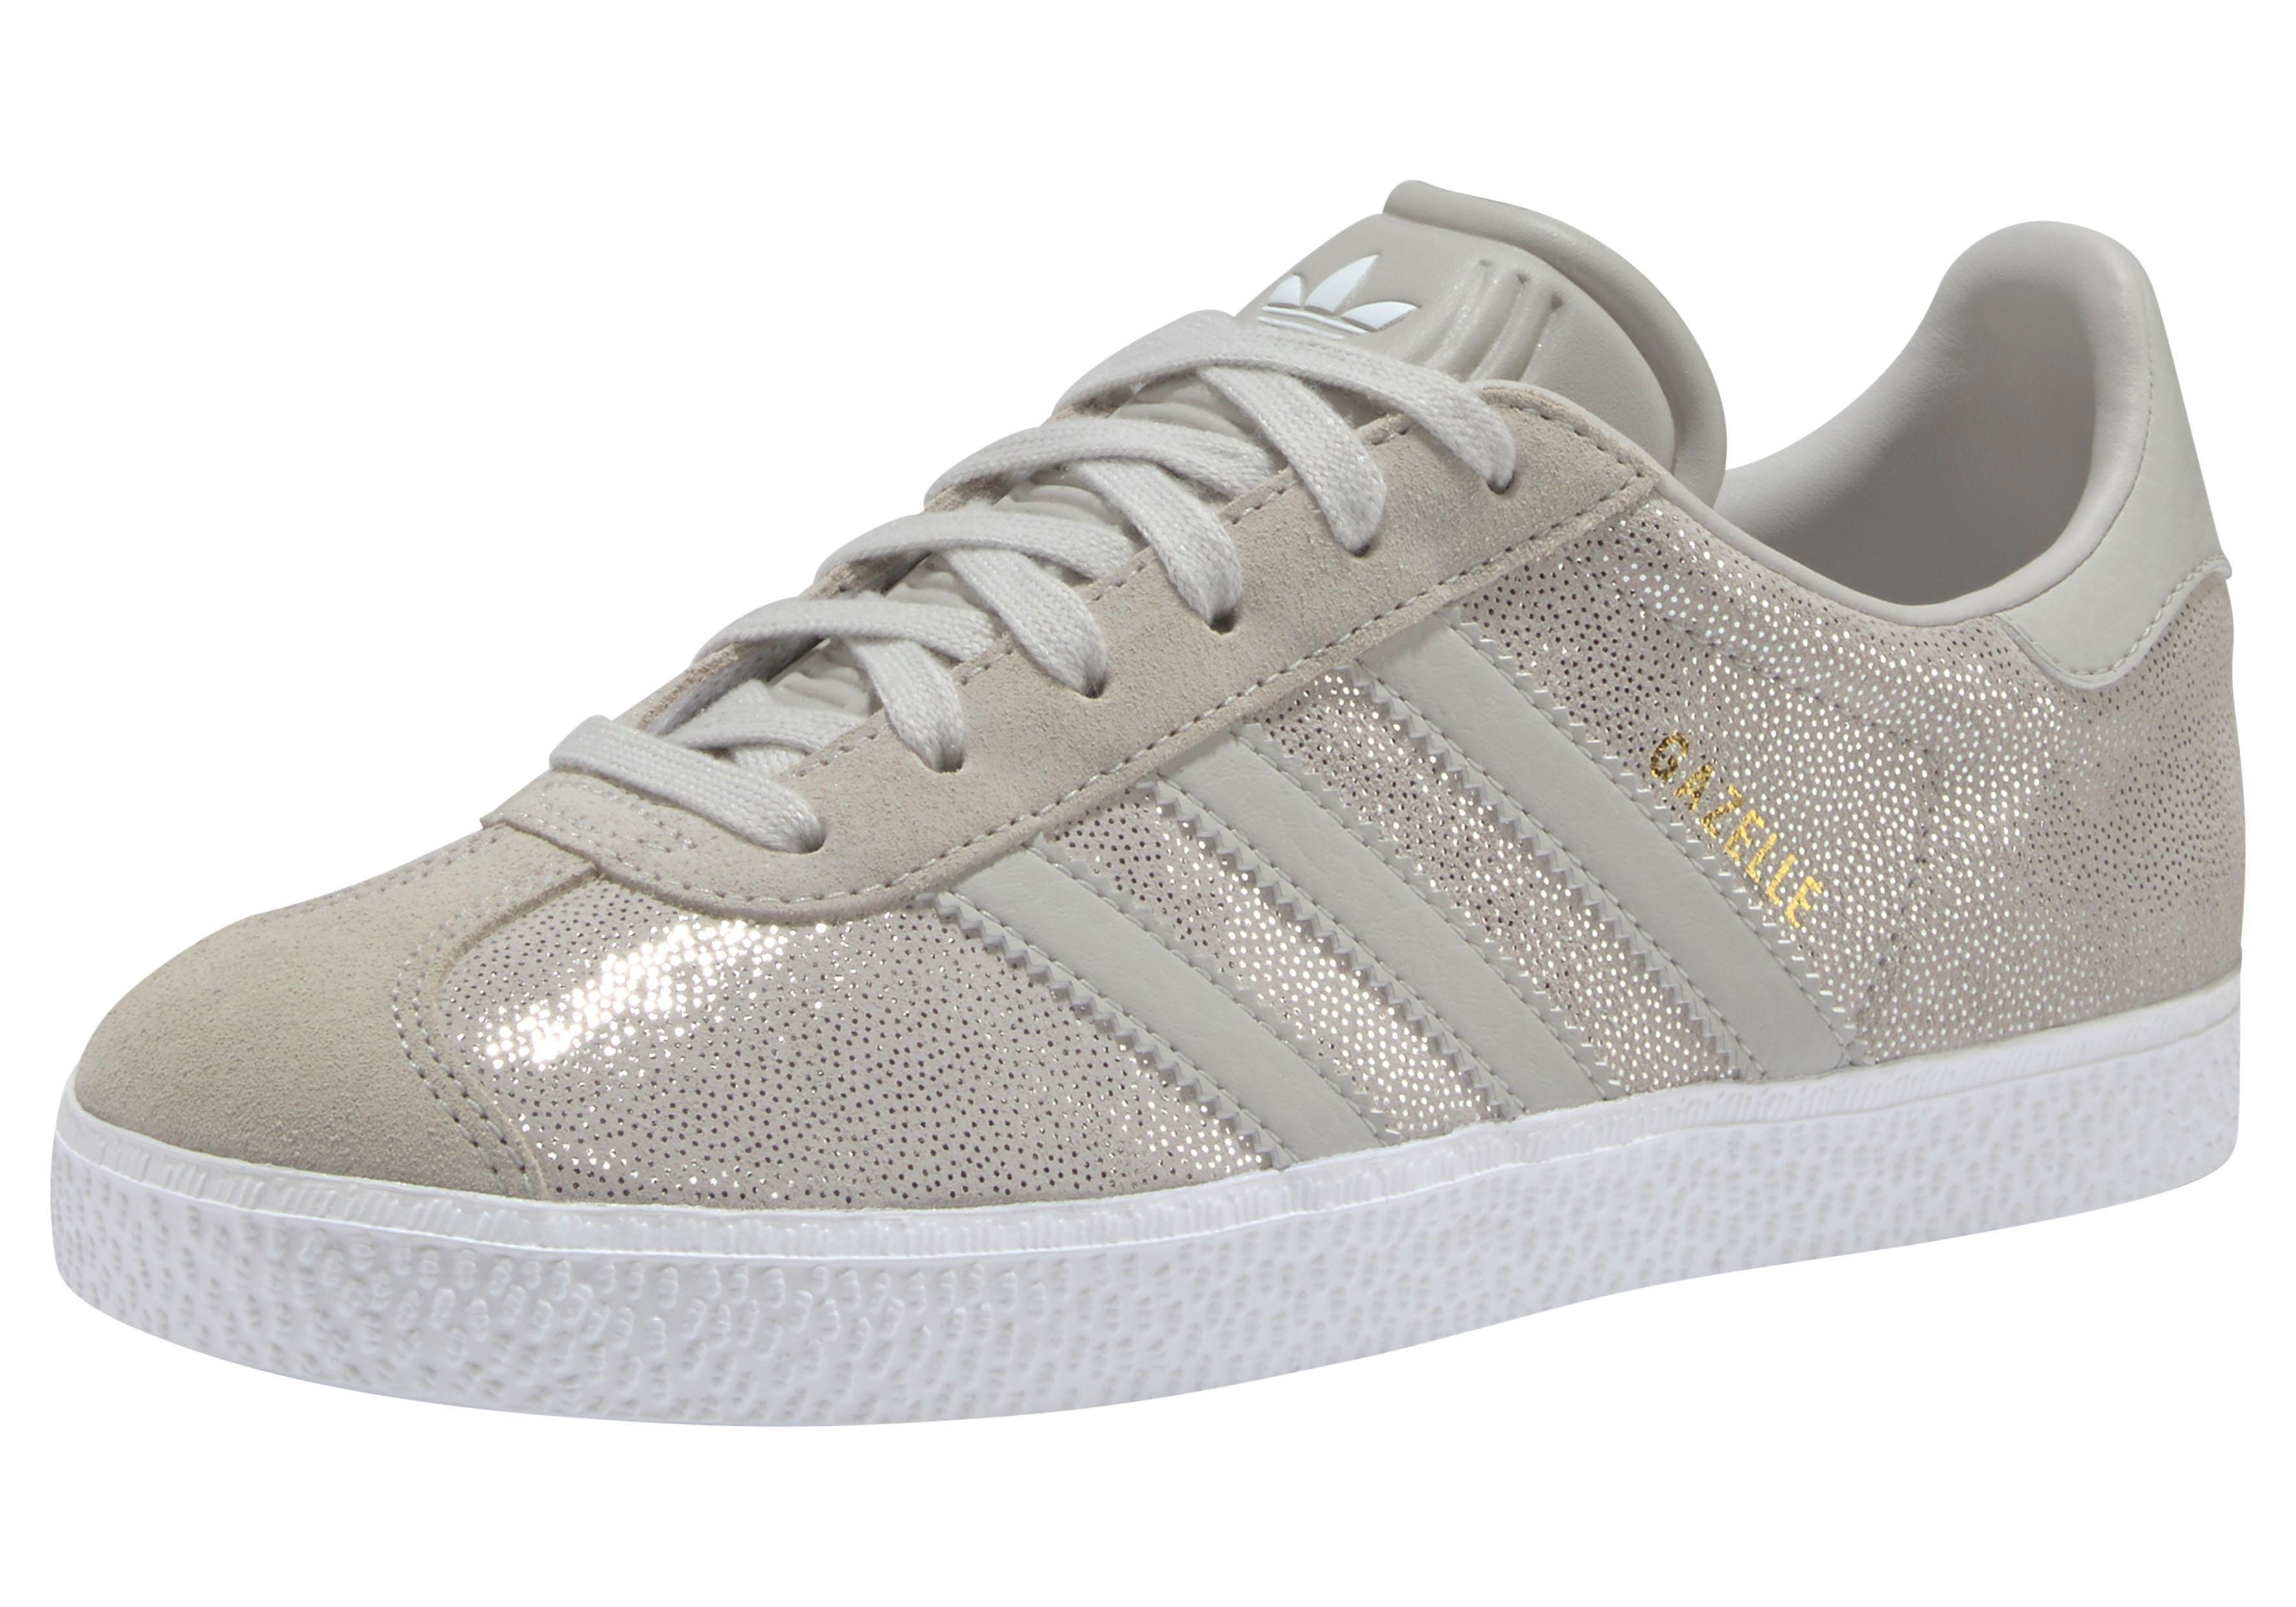 47358f7aa3e ... adidas Originals sneakers »Gazelle W«, adidas Originals sneakers » Gazelle W«, adidas Originals sneakers »Gazelle W«